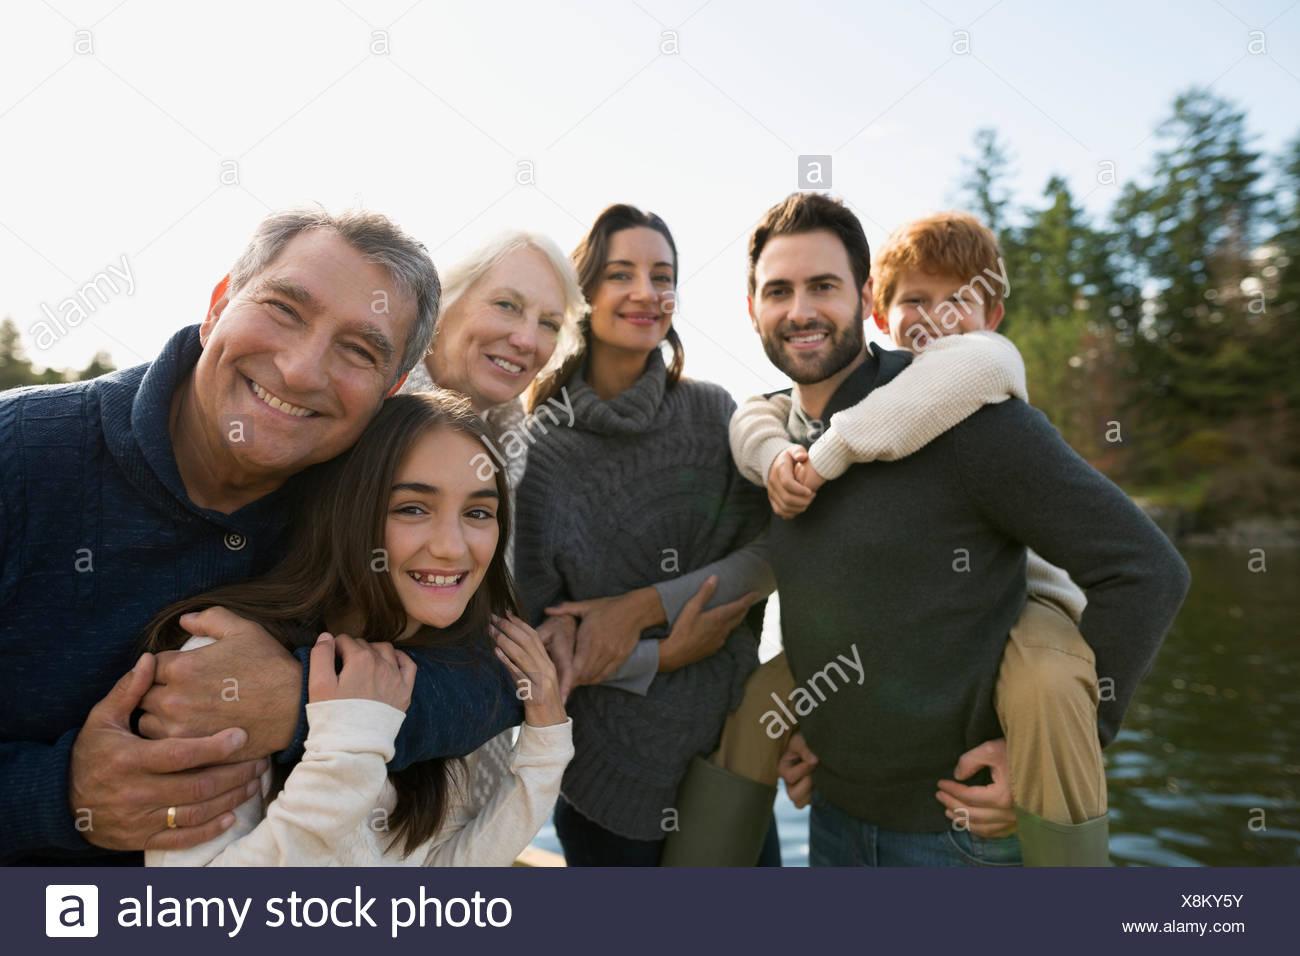 Portrait multi-generation family at lakeside - Stock Image